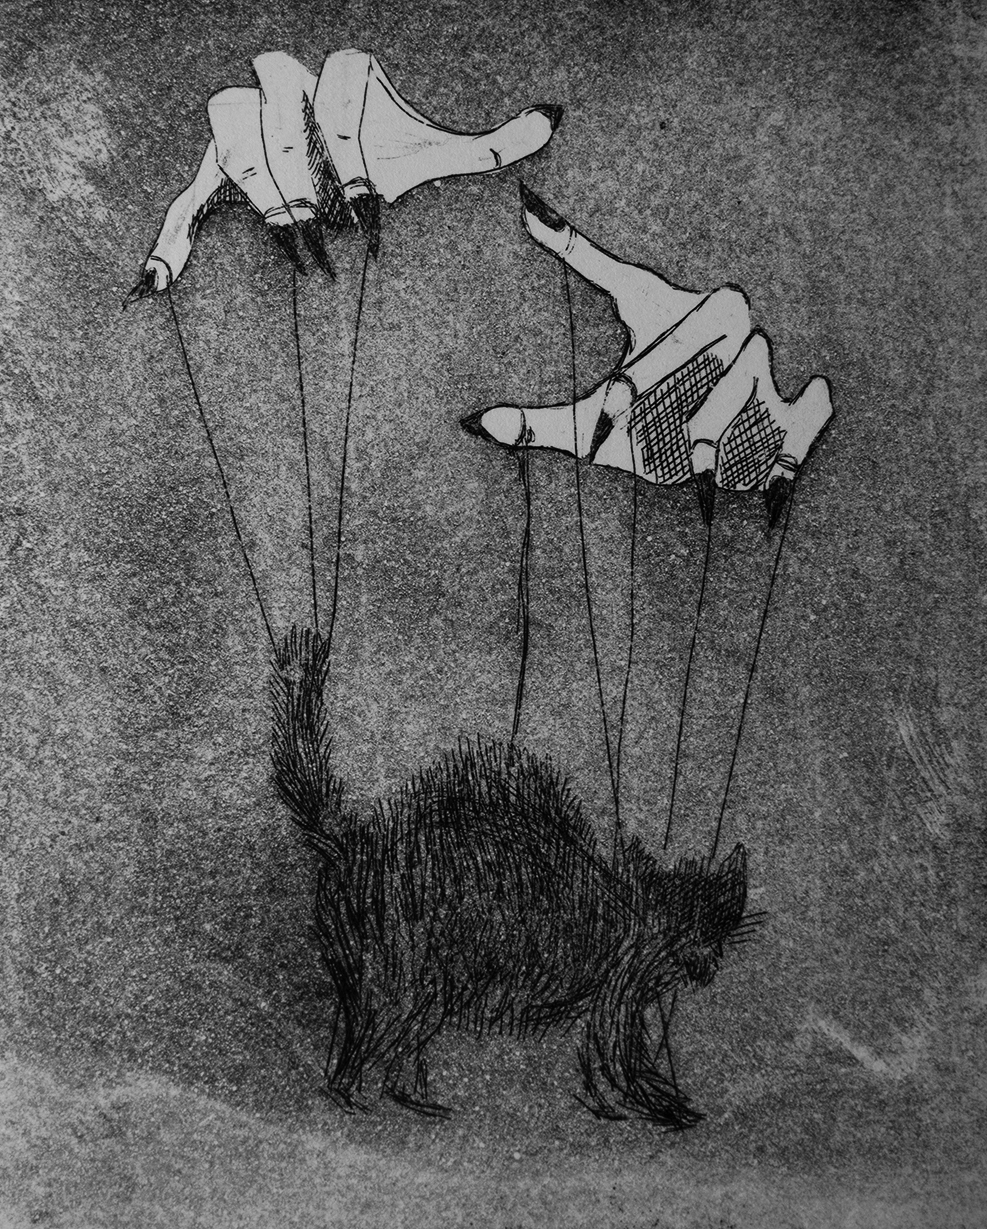 Mystique,  2014, etching and aqua tint on paper, 4.25x5''